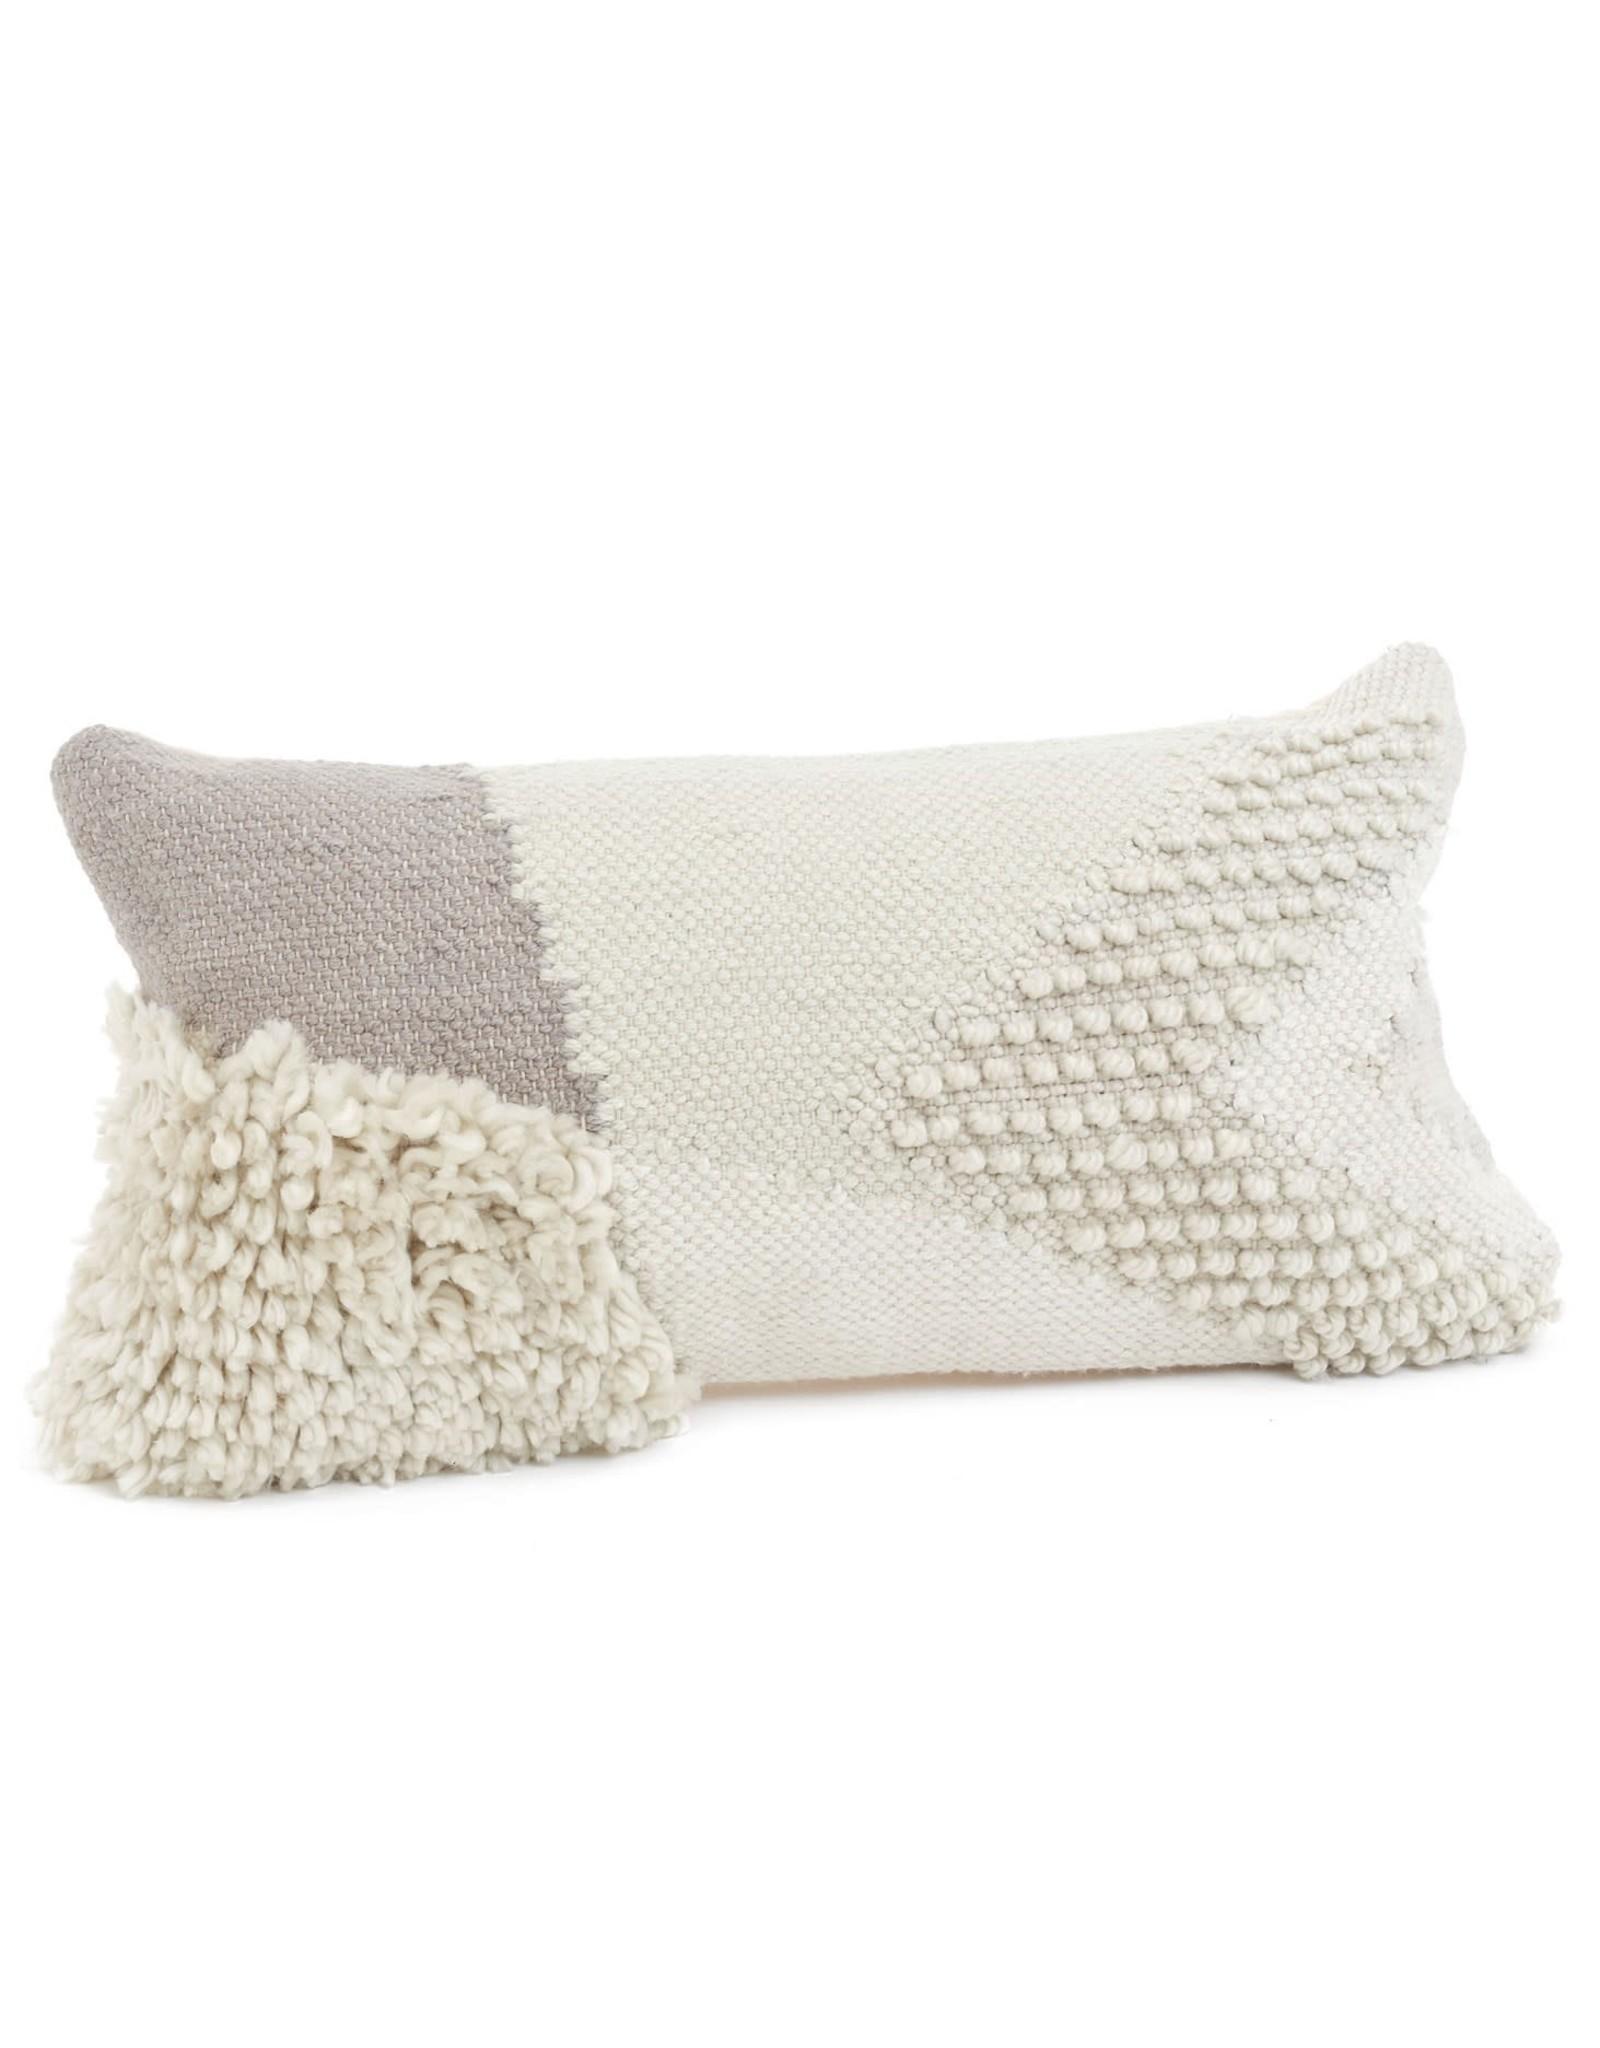 Muller Wool Cushion 12x22